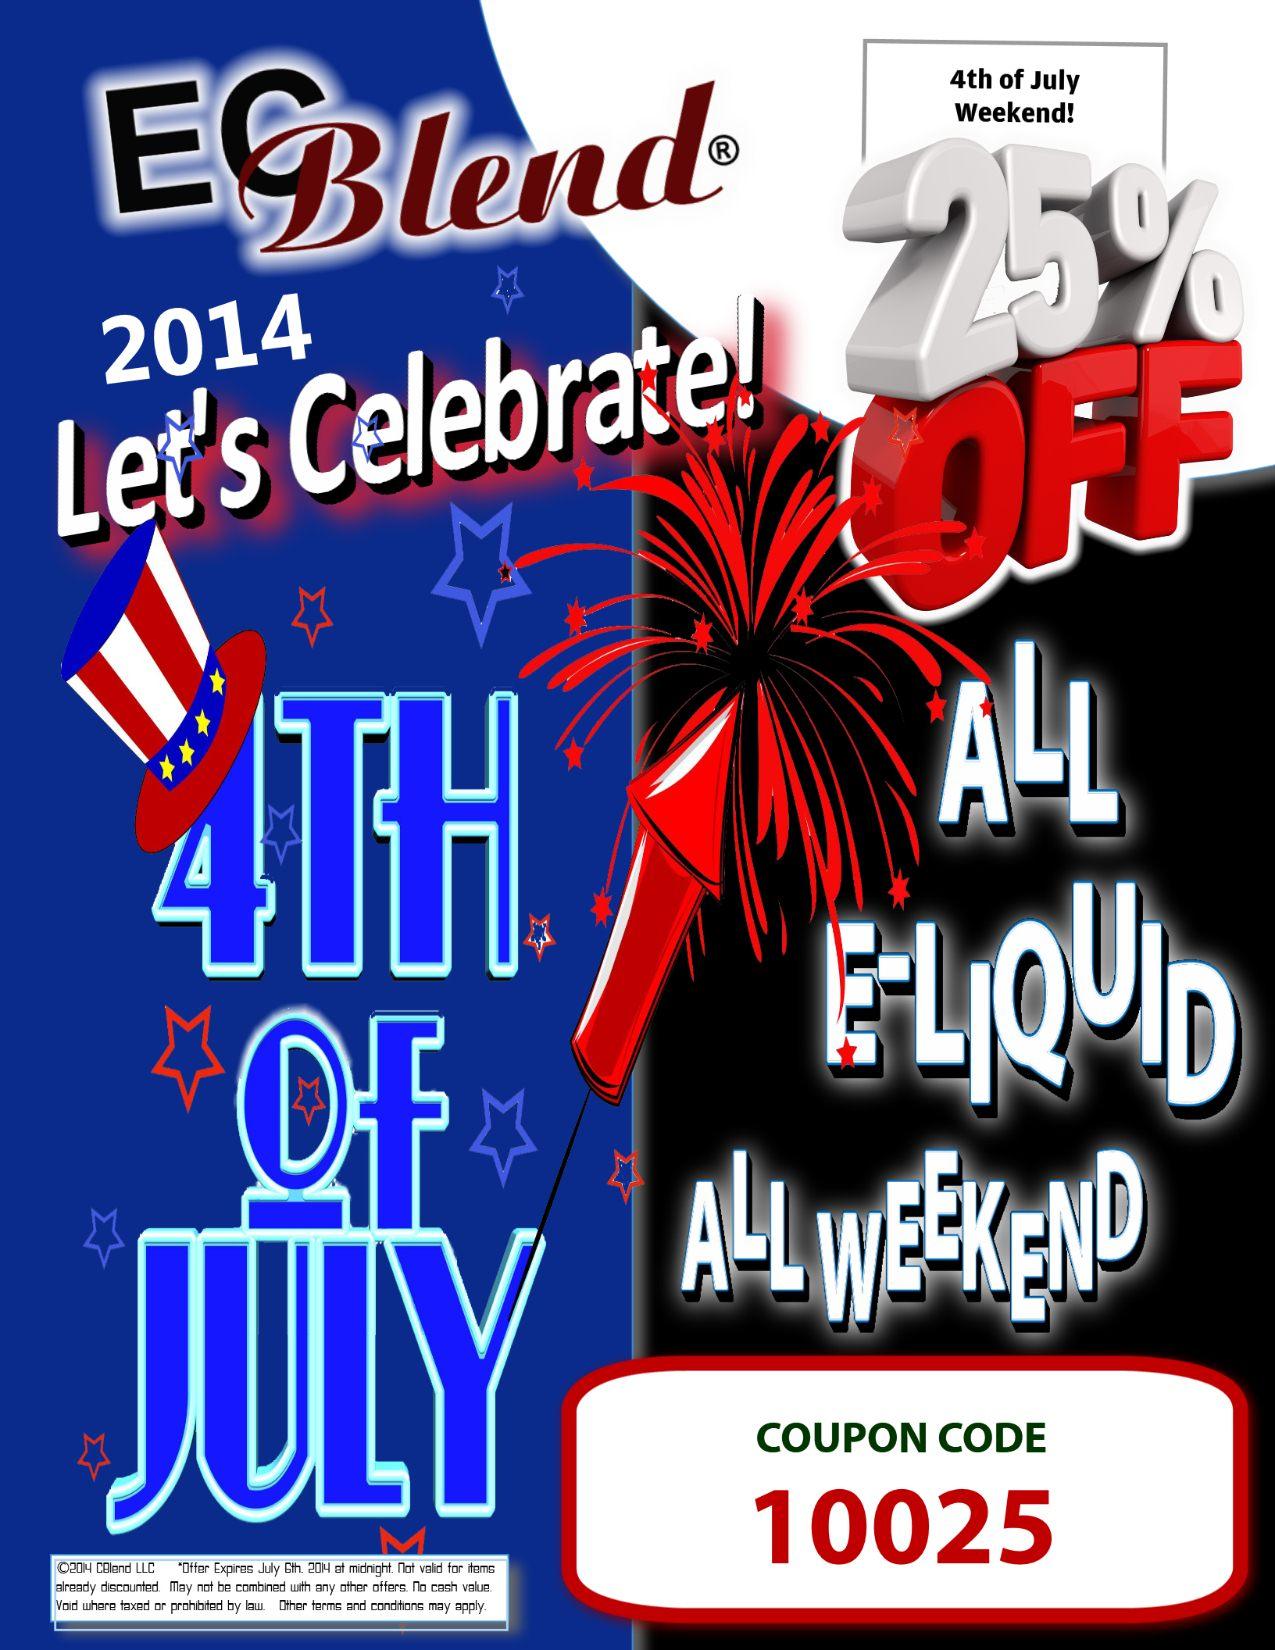 ECBlend ELiquid 4th of July Sale